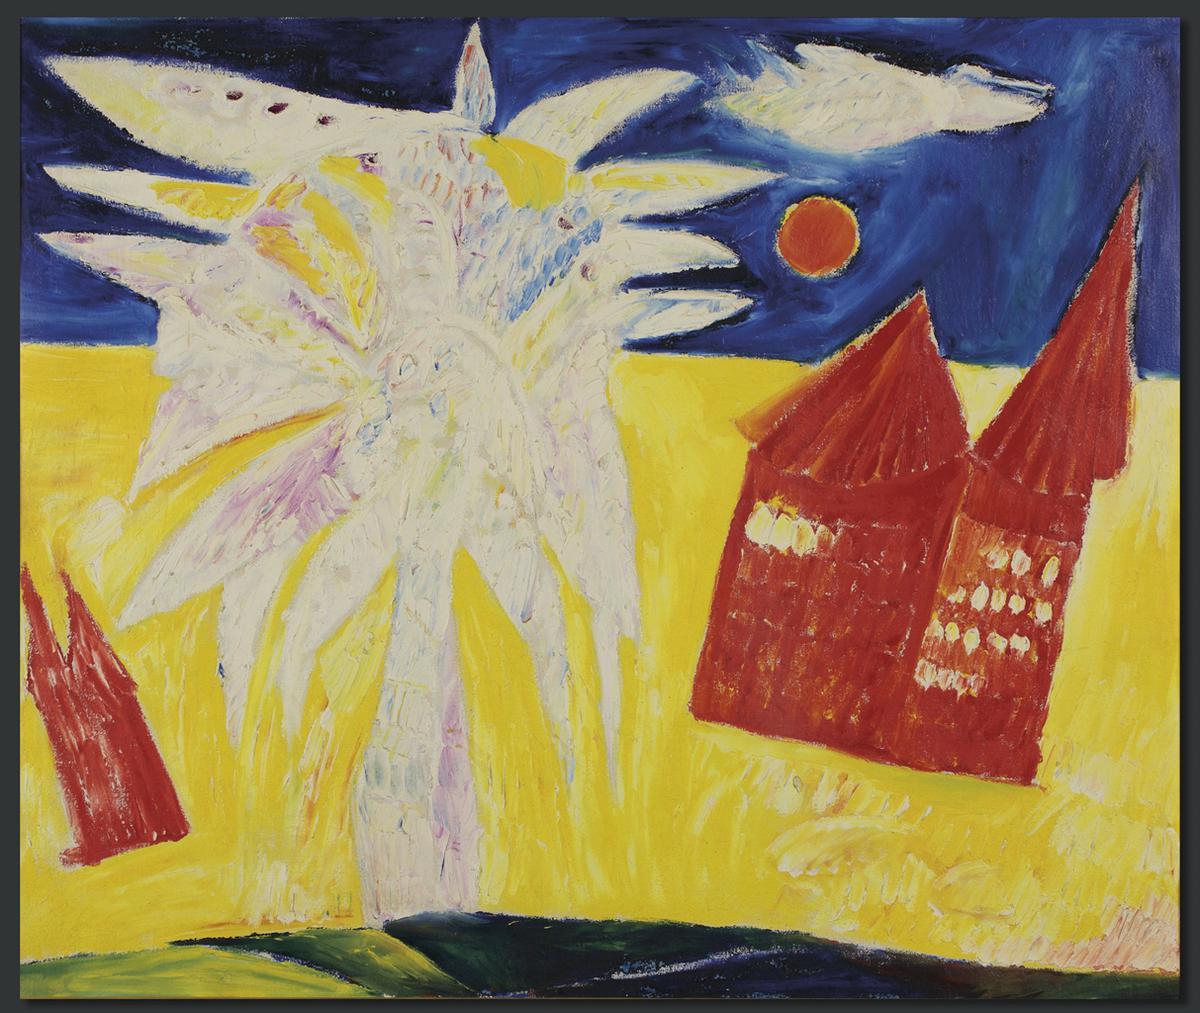 Carl-Henning Pedersen-Det Rode Hus (The Red House)-1952